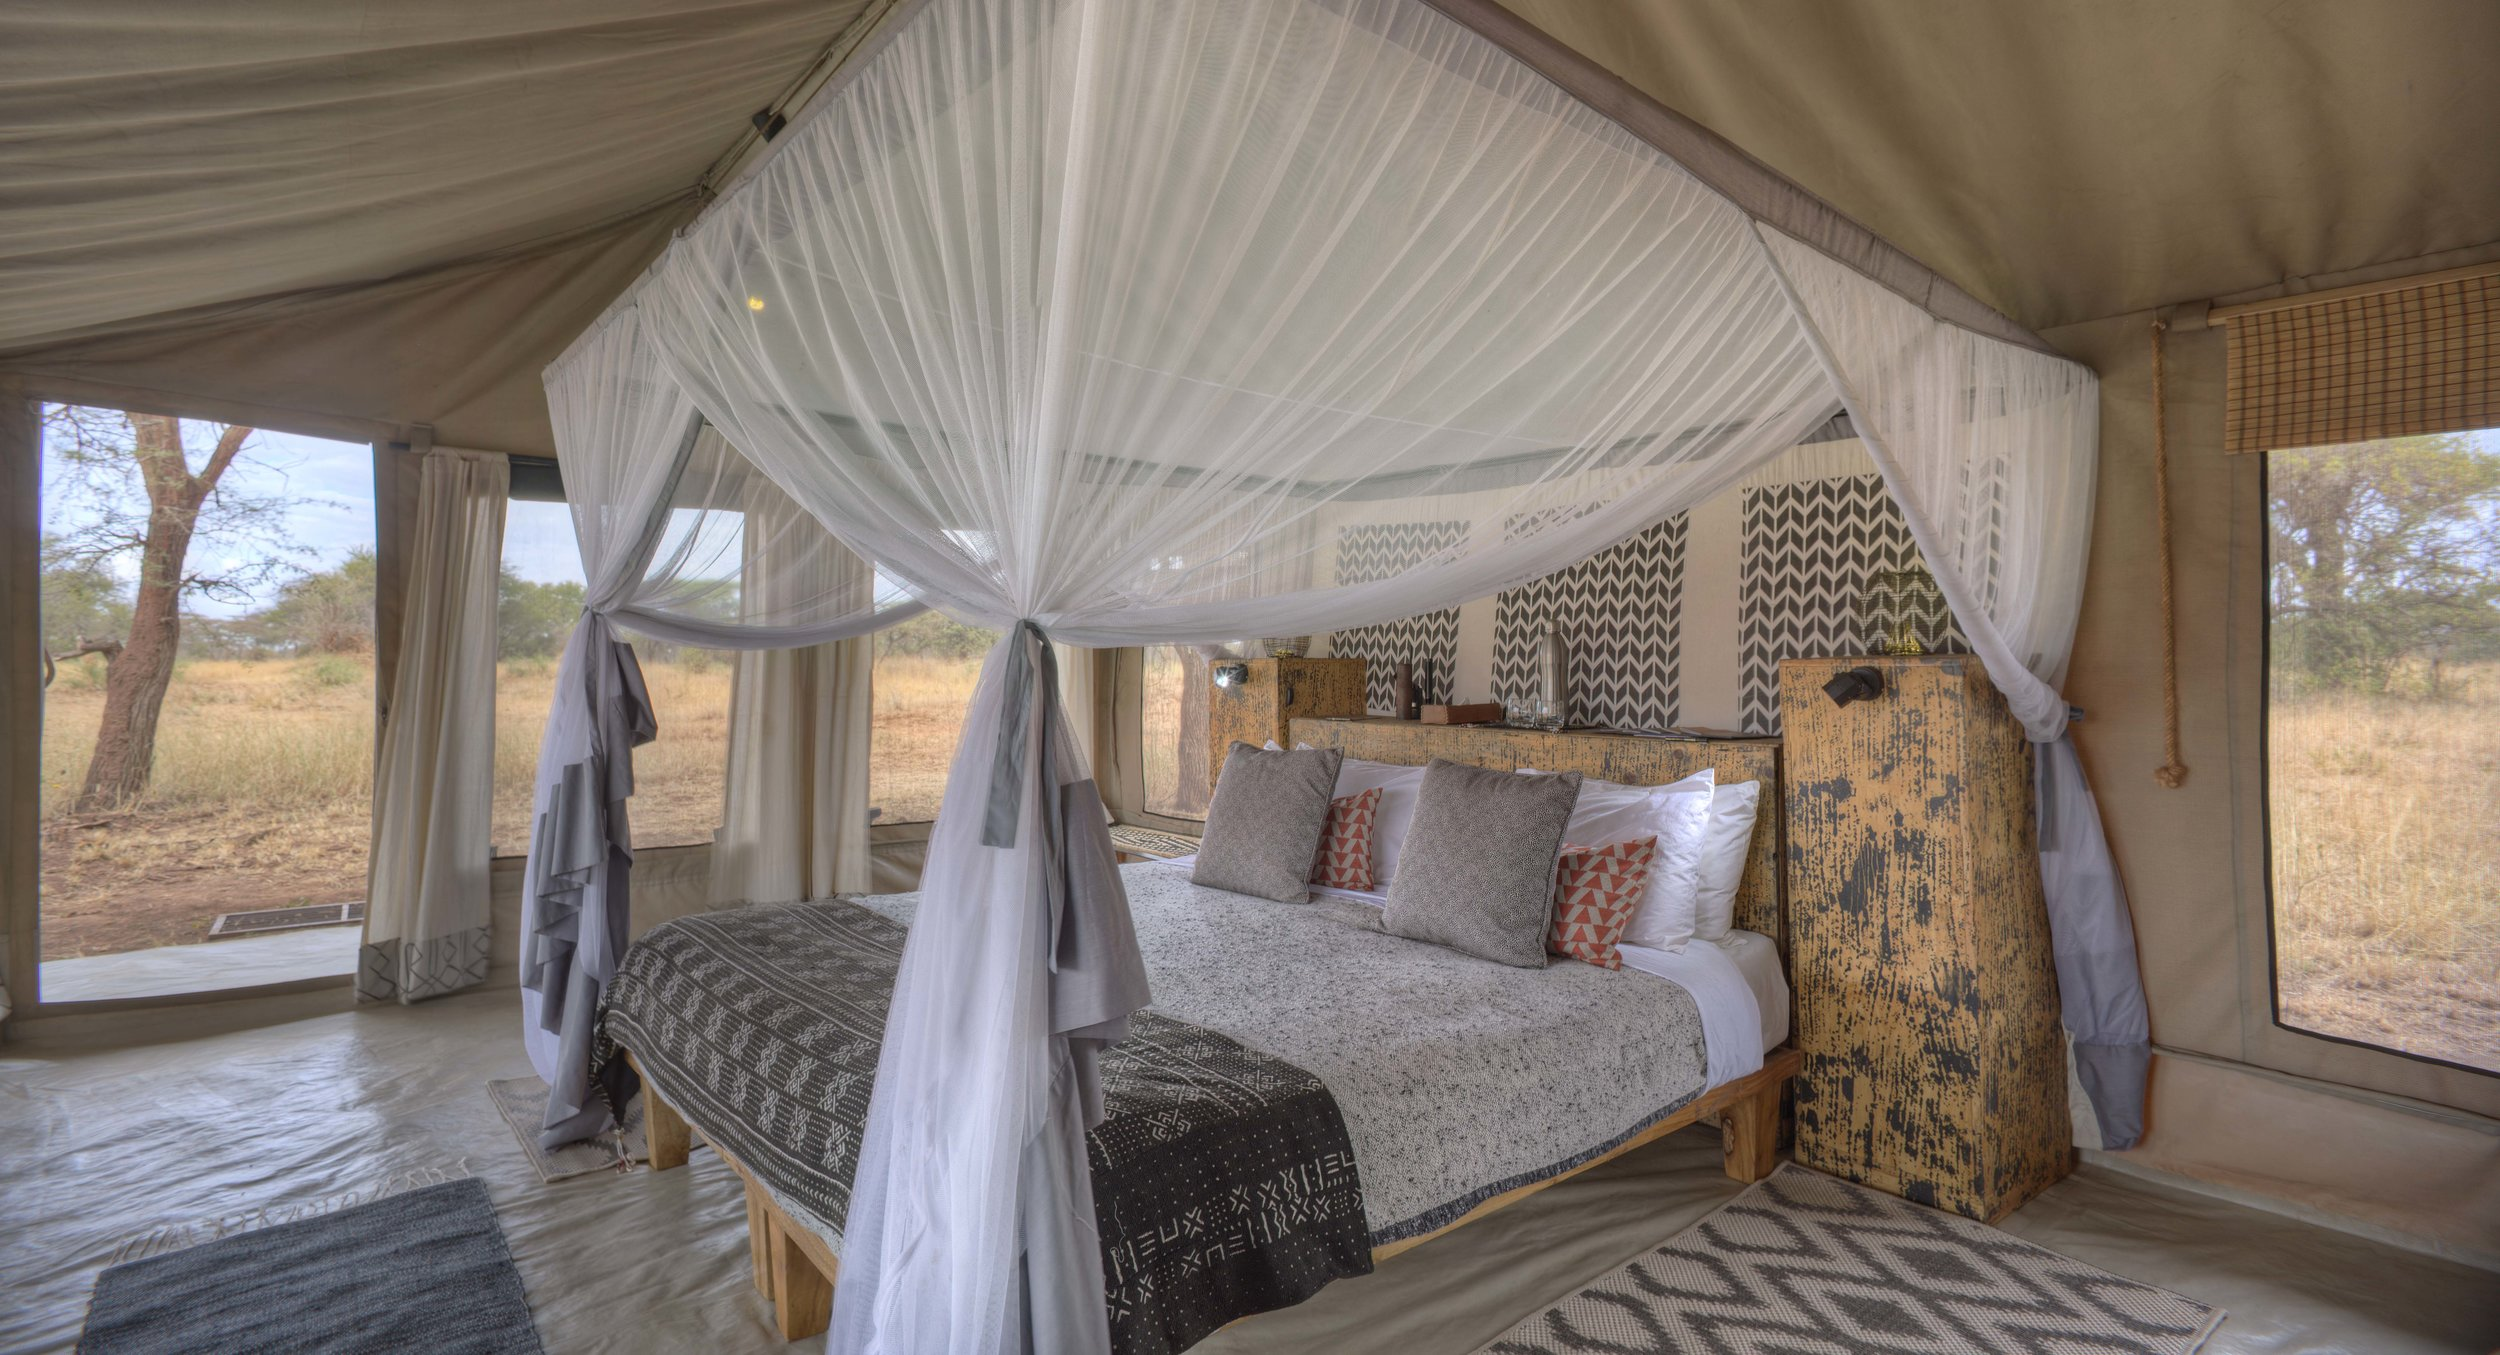 ubuntu-camp-bed.jpg